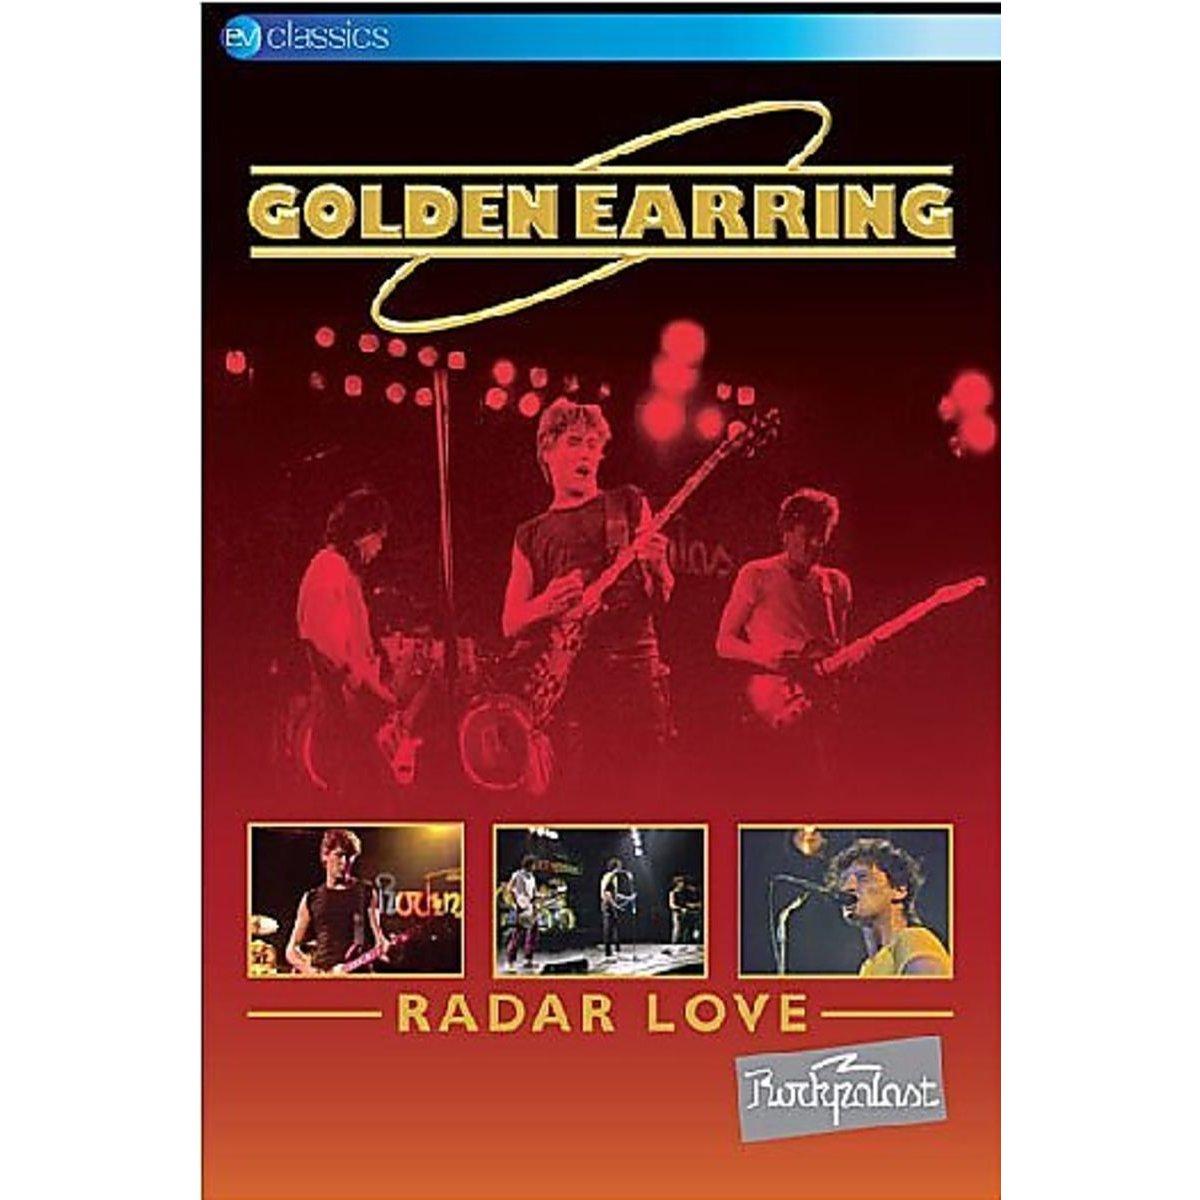 Golden Earring – Radar Love 1982 at Rockpalast DVD